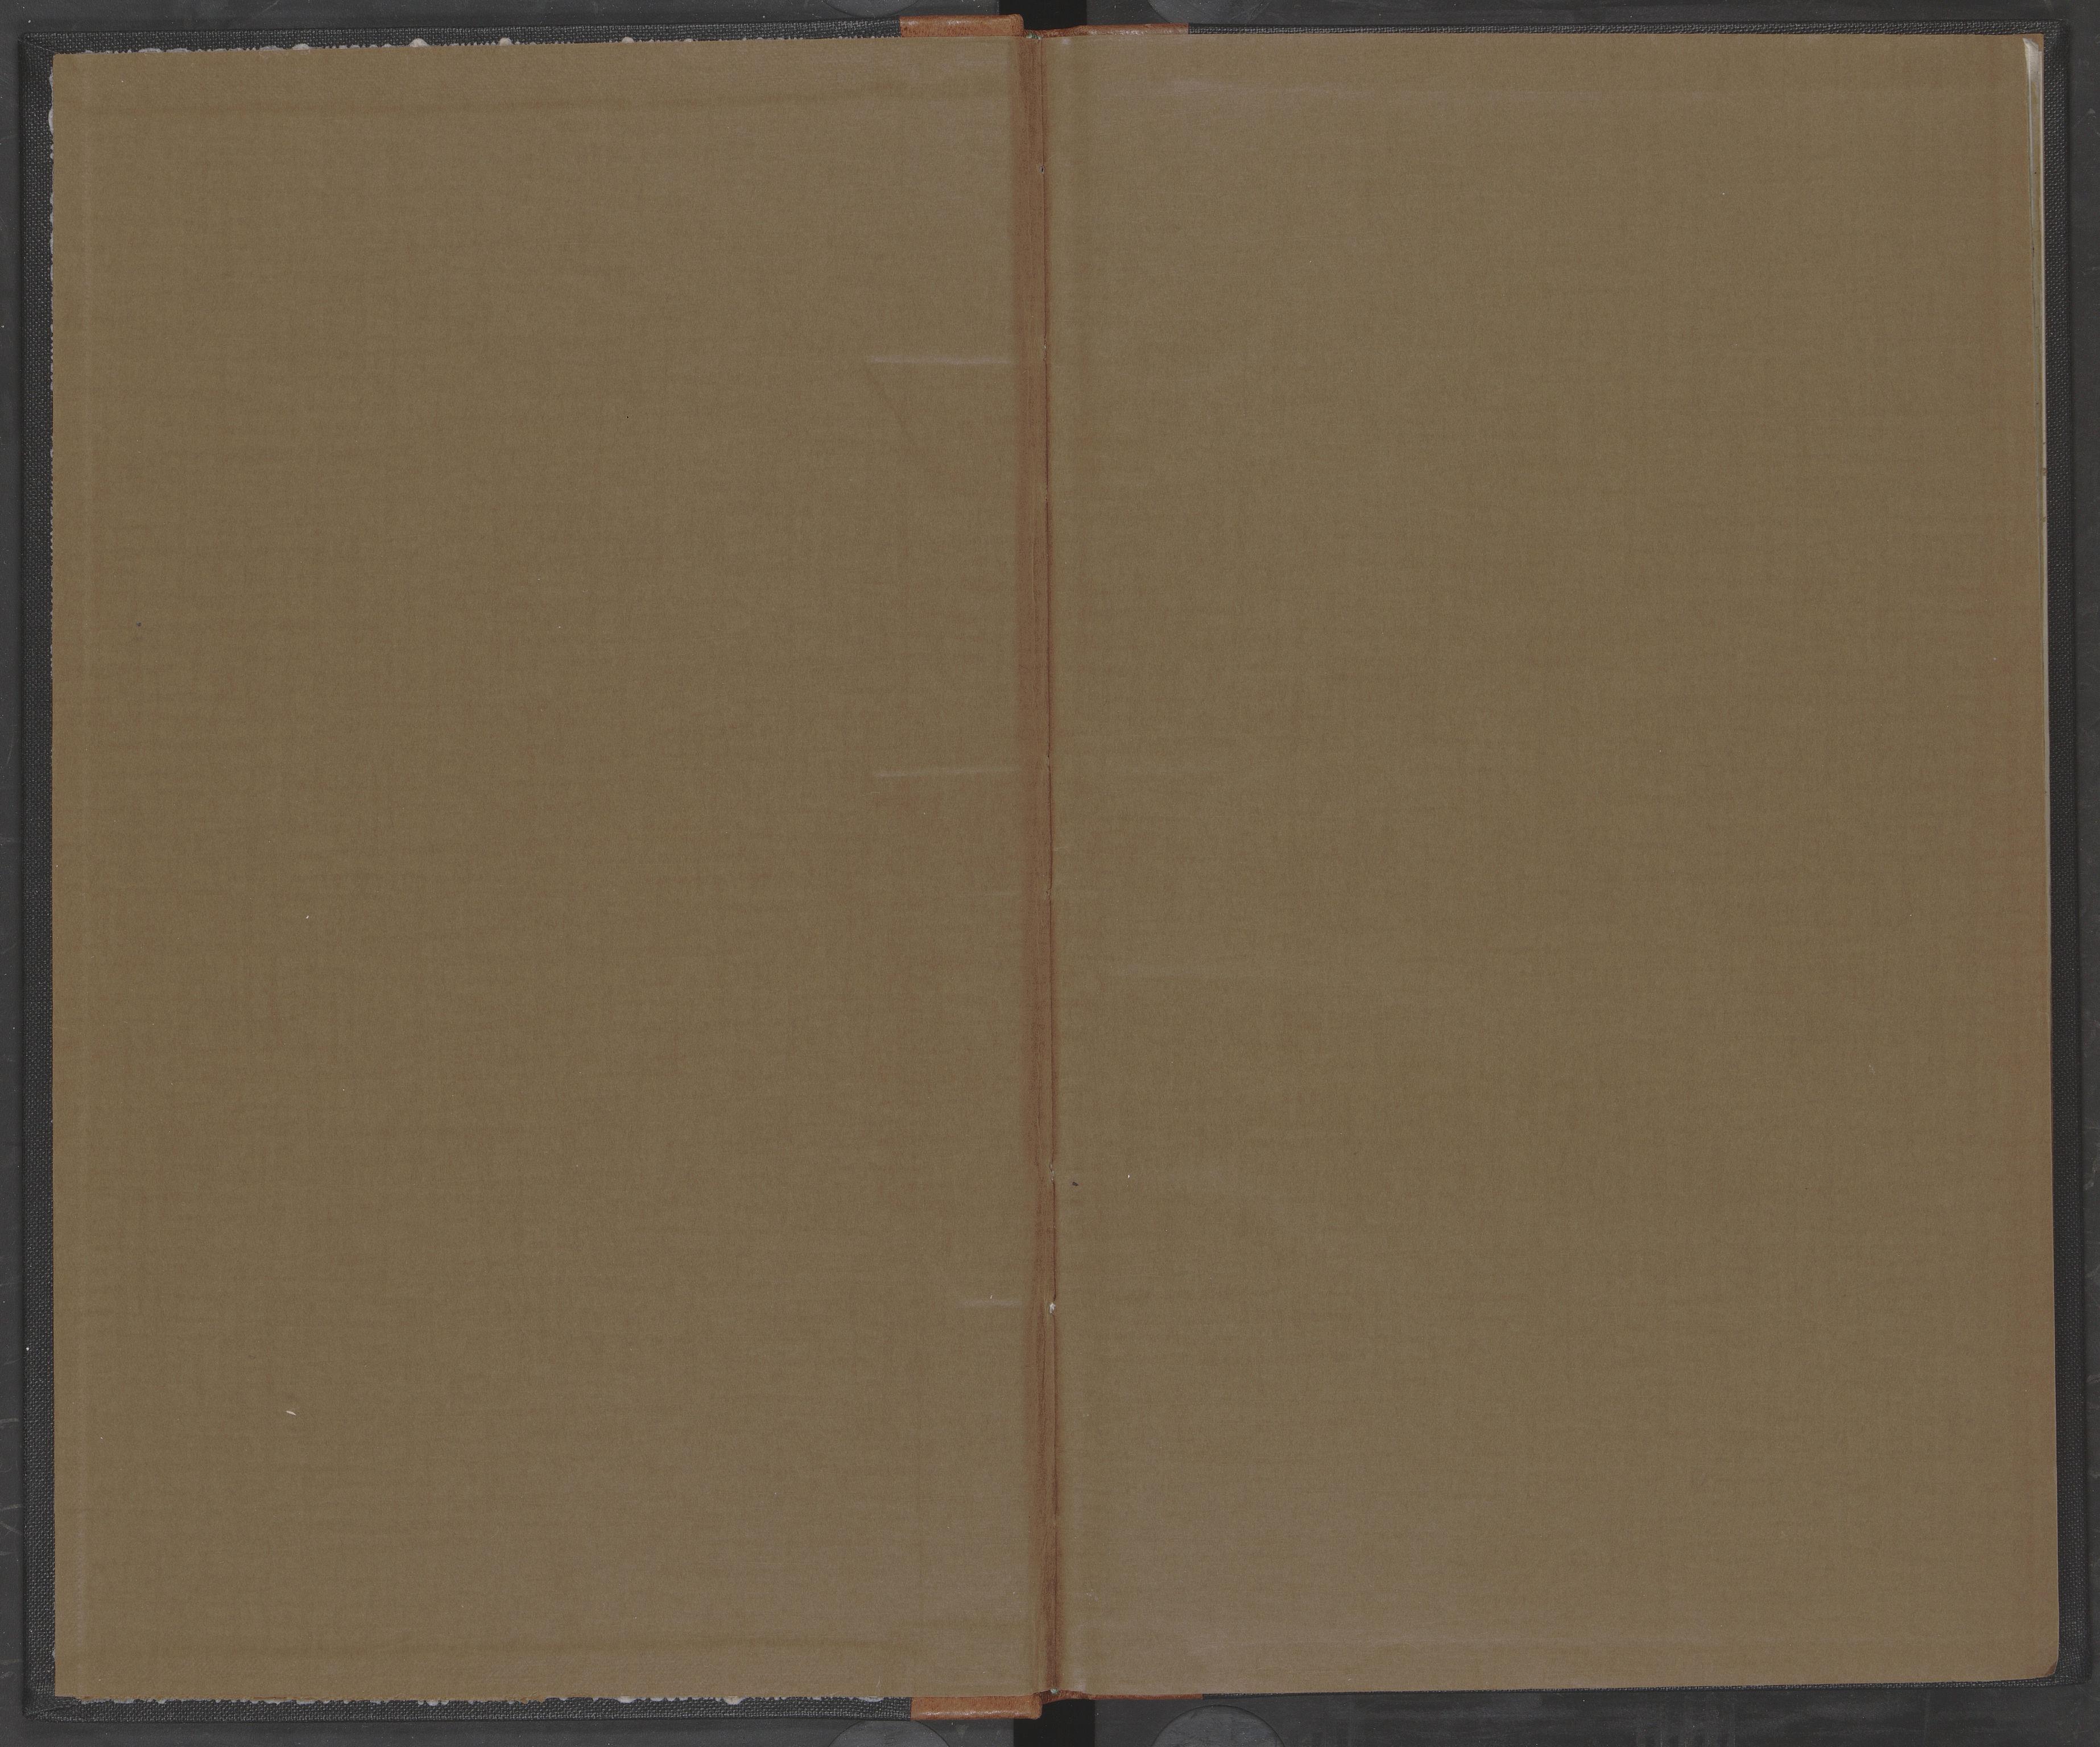 AIN, Bindal kommune. Formannskapet, A/Aa/L0000a: Møtebok, 1843-1881